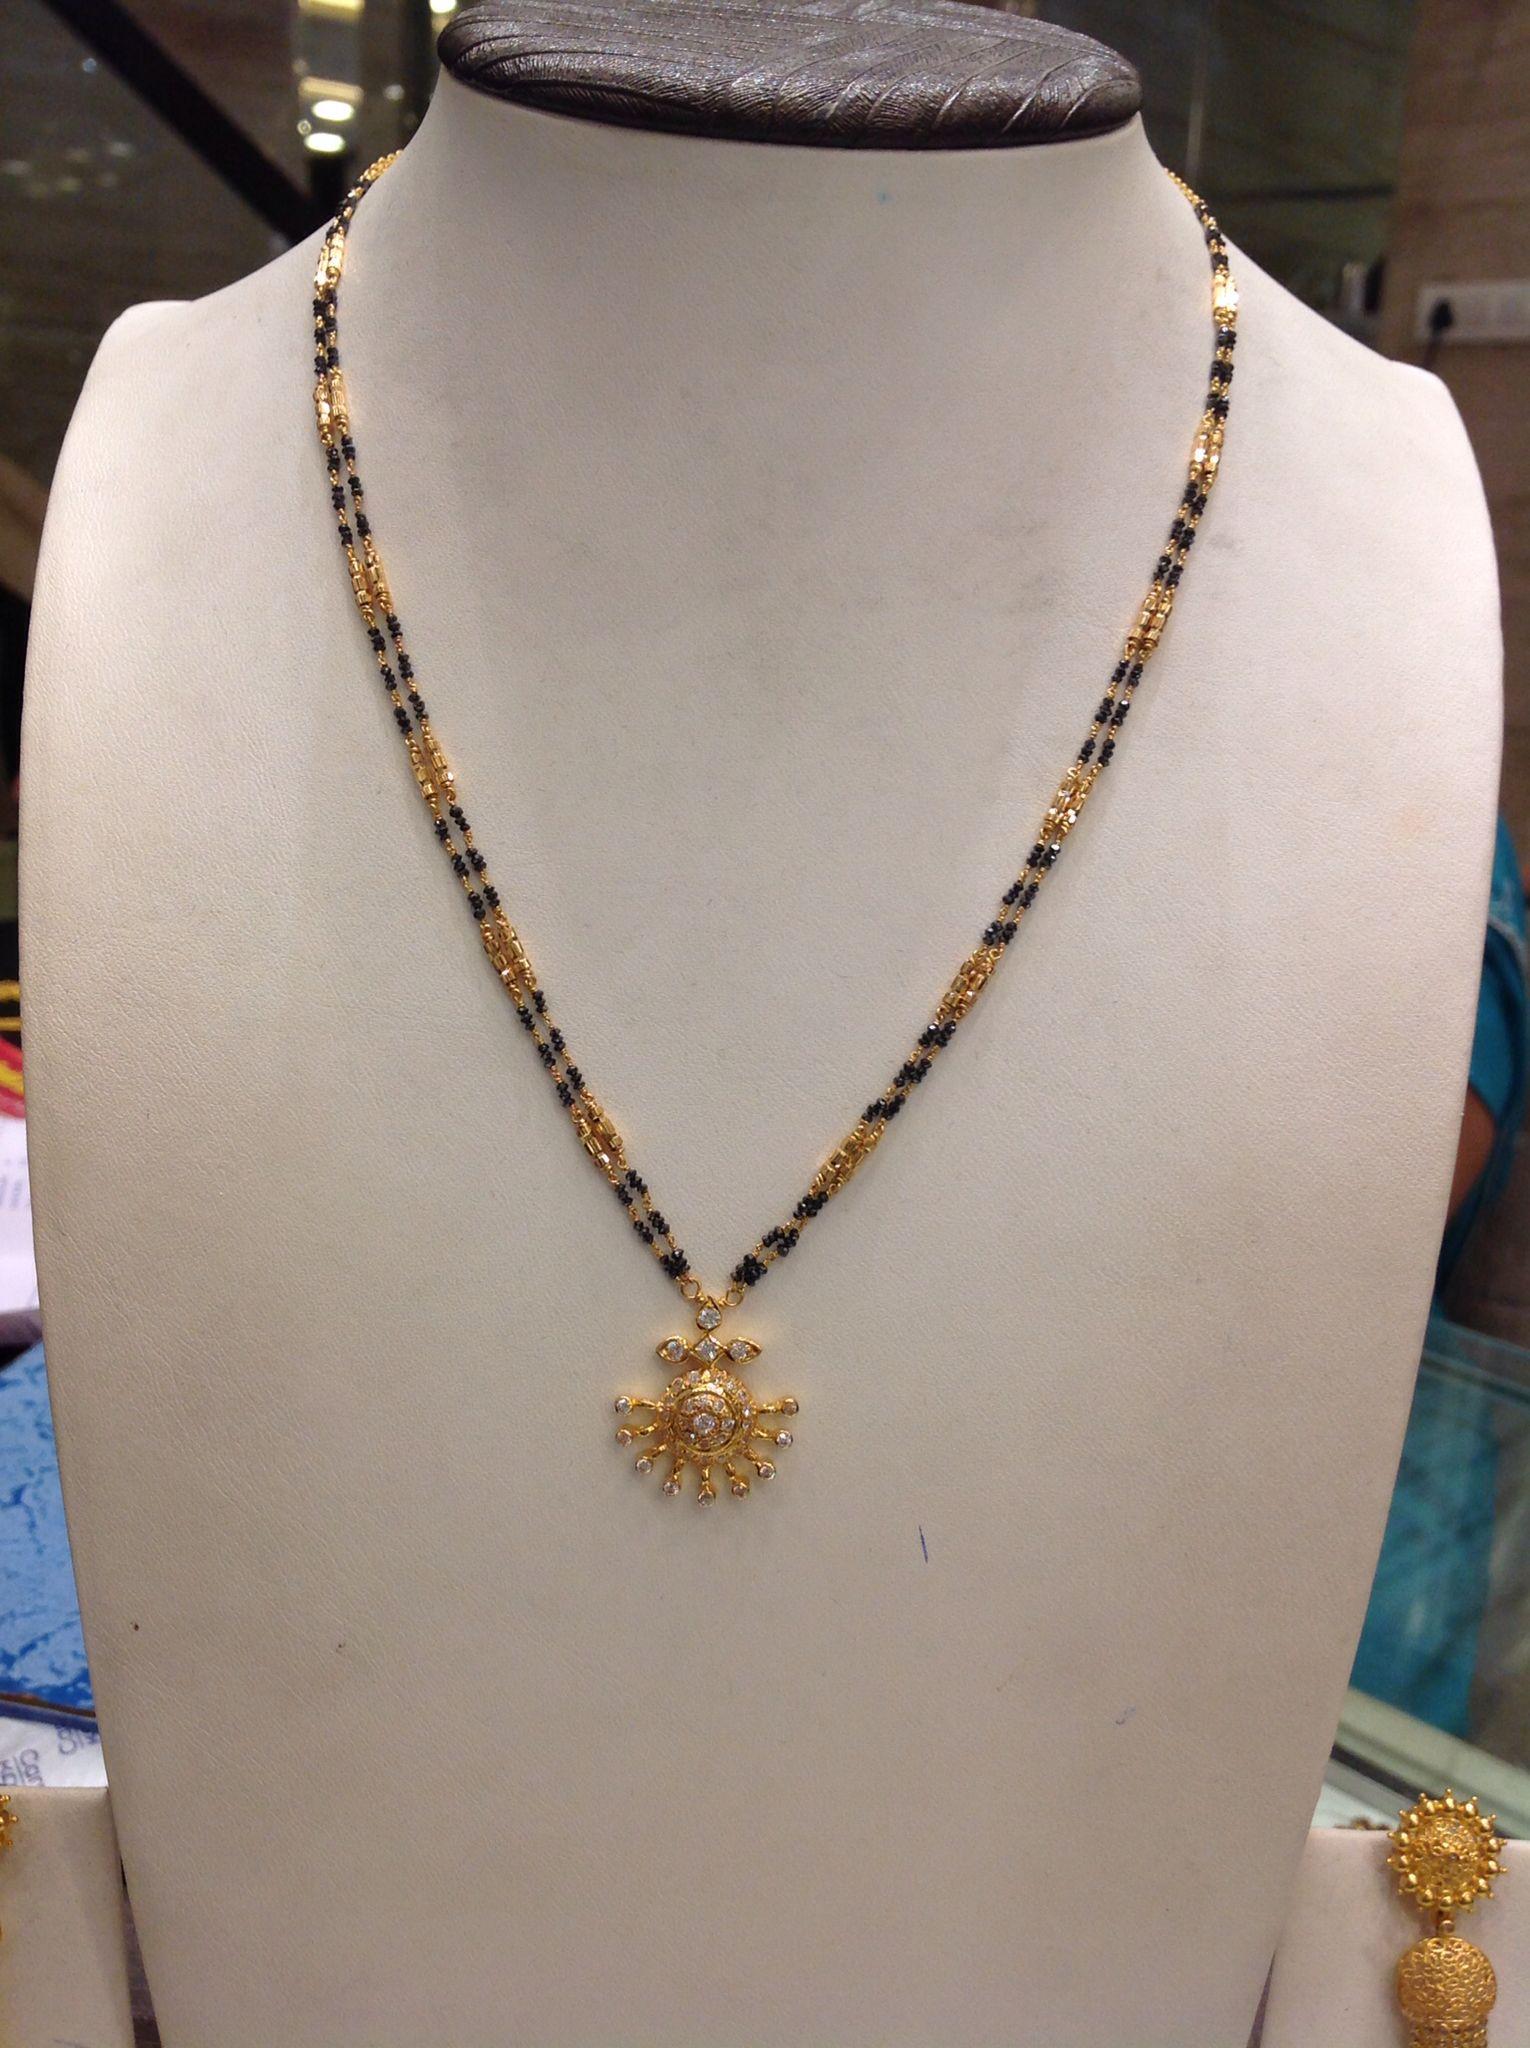 And contemporary gold jhumkas collection by khazana jewellery - Blackbeeds 12 Gms Gold Jewelleryjewellery Designsdiamond